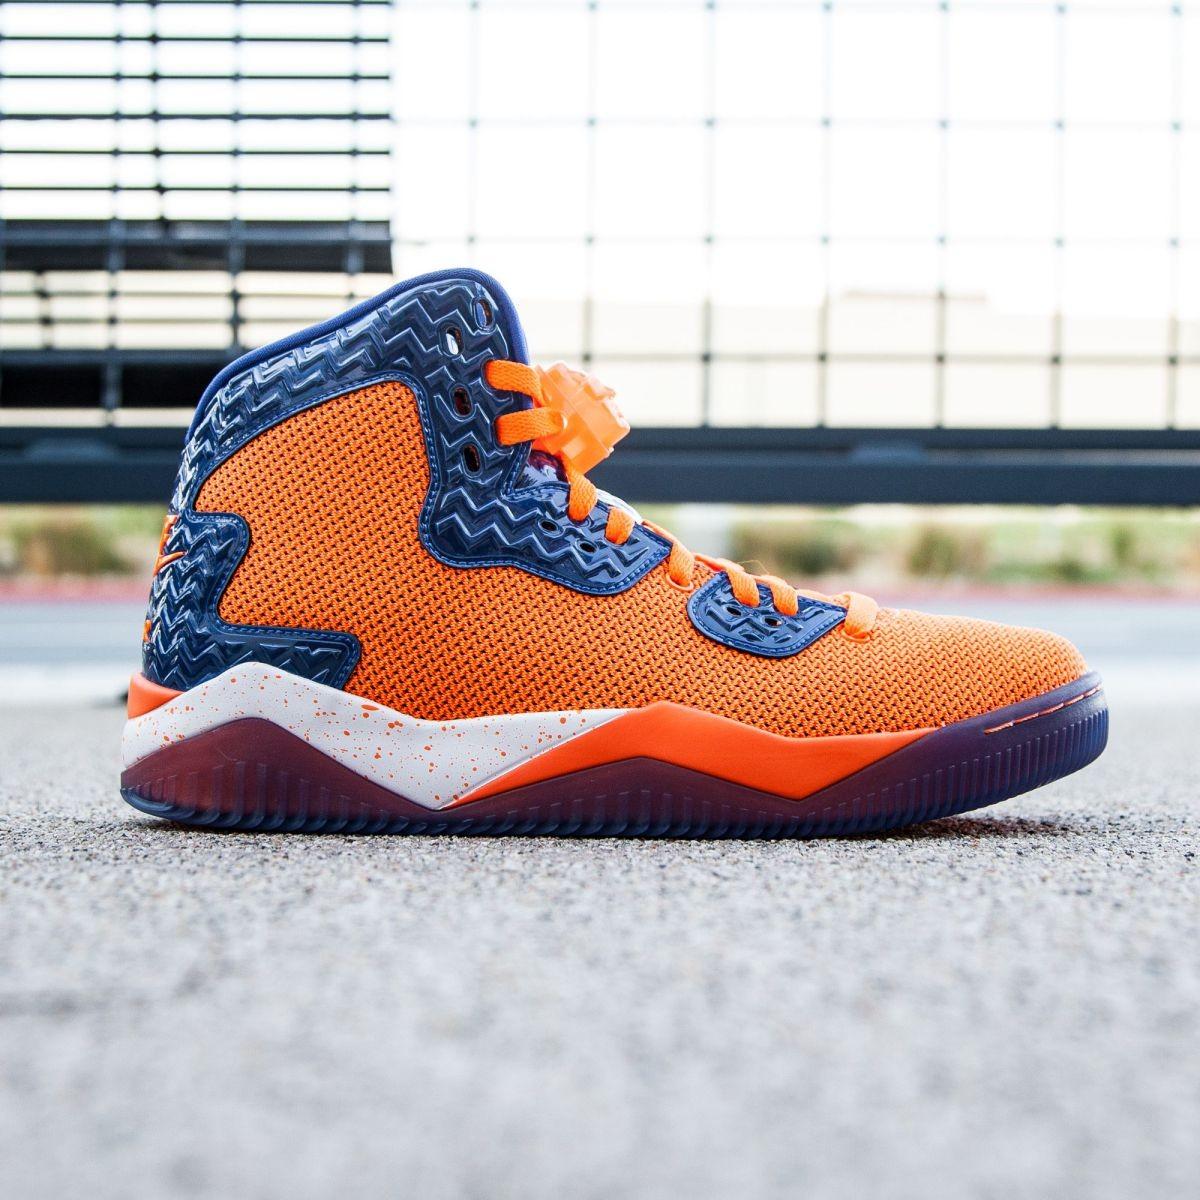 hot sale online 0f802 e3d4f Jordan Men Air Jordan Spike Forty PE orange total orange game royal white